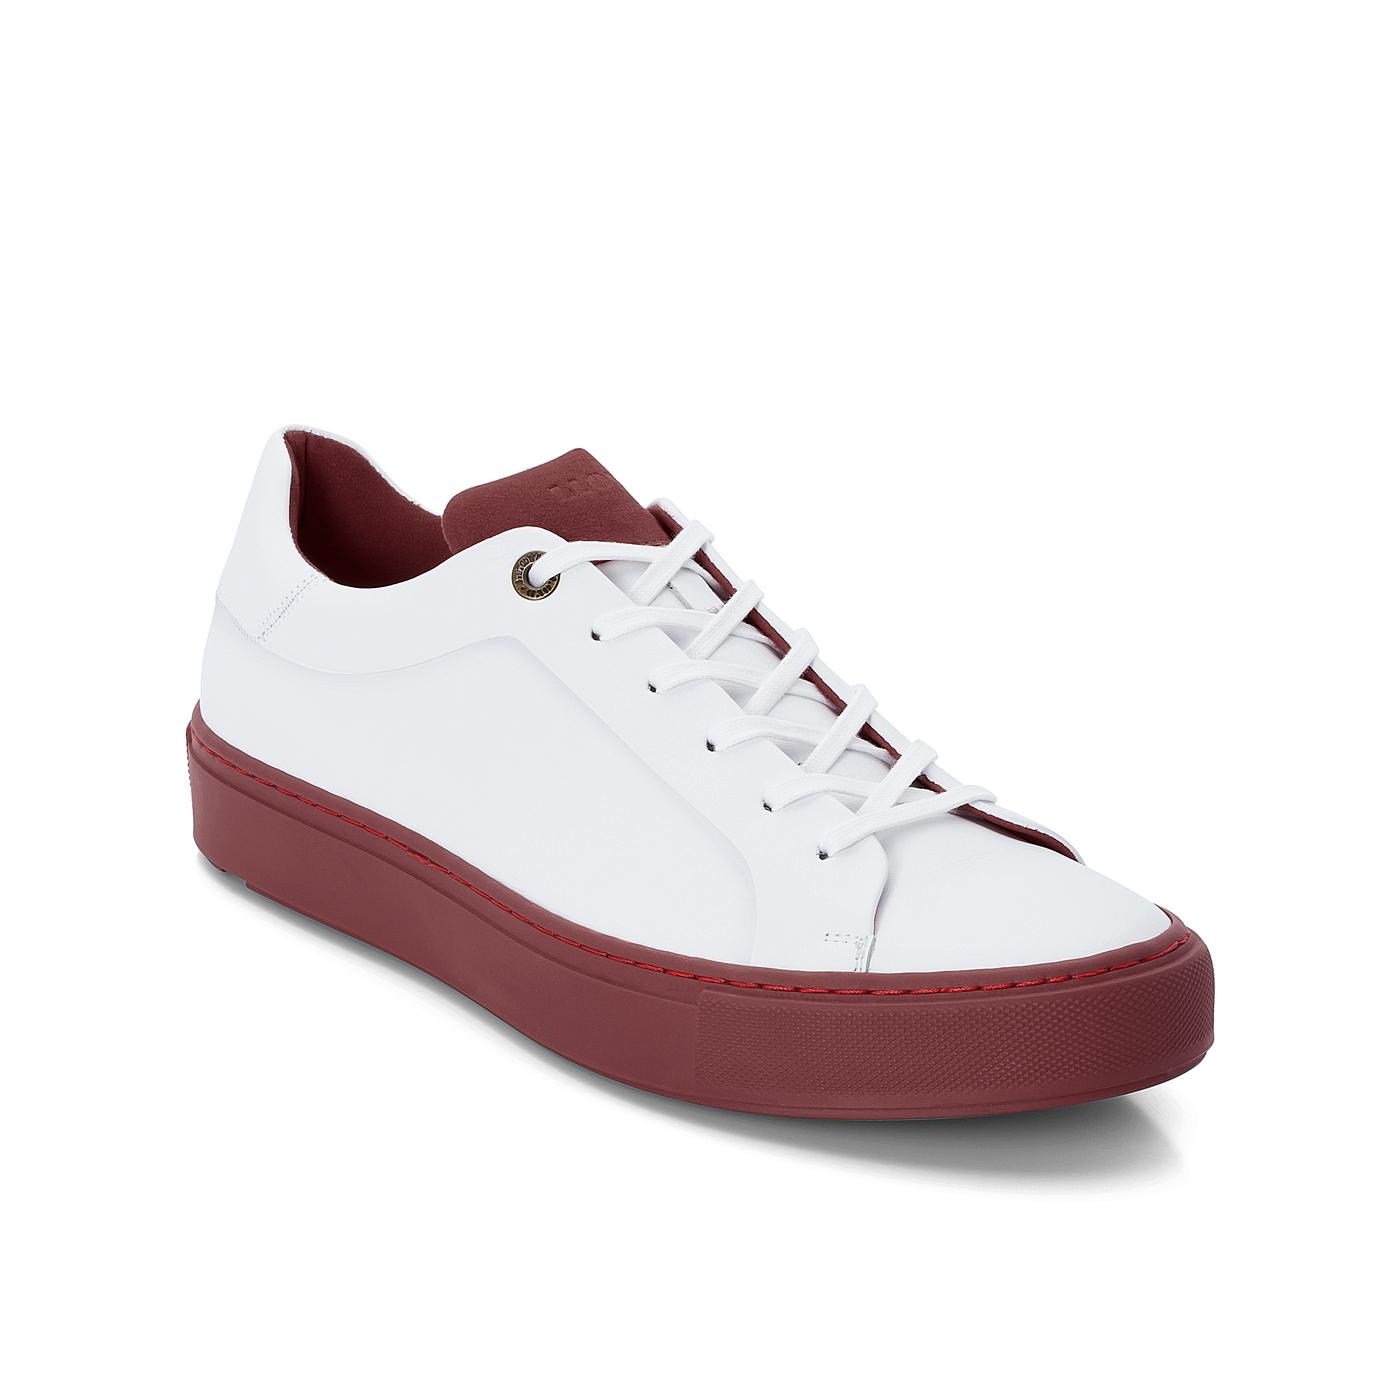 ARIZONA | Schuhe > Sneaker > Sneaker high | Lloyd